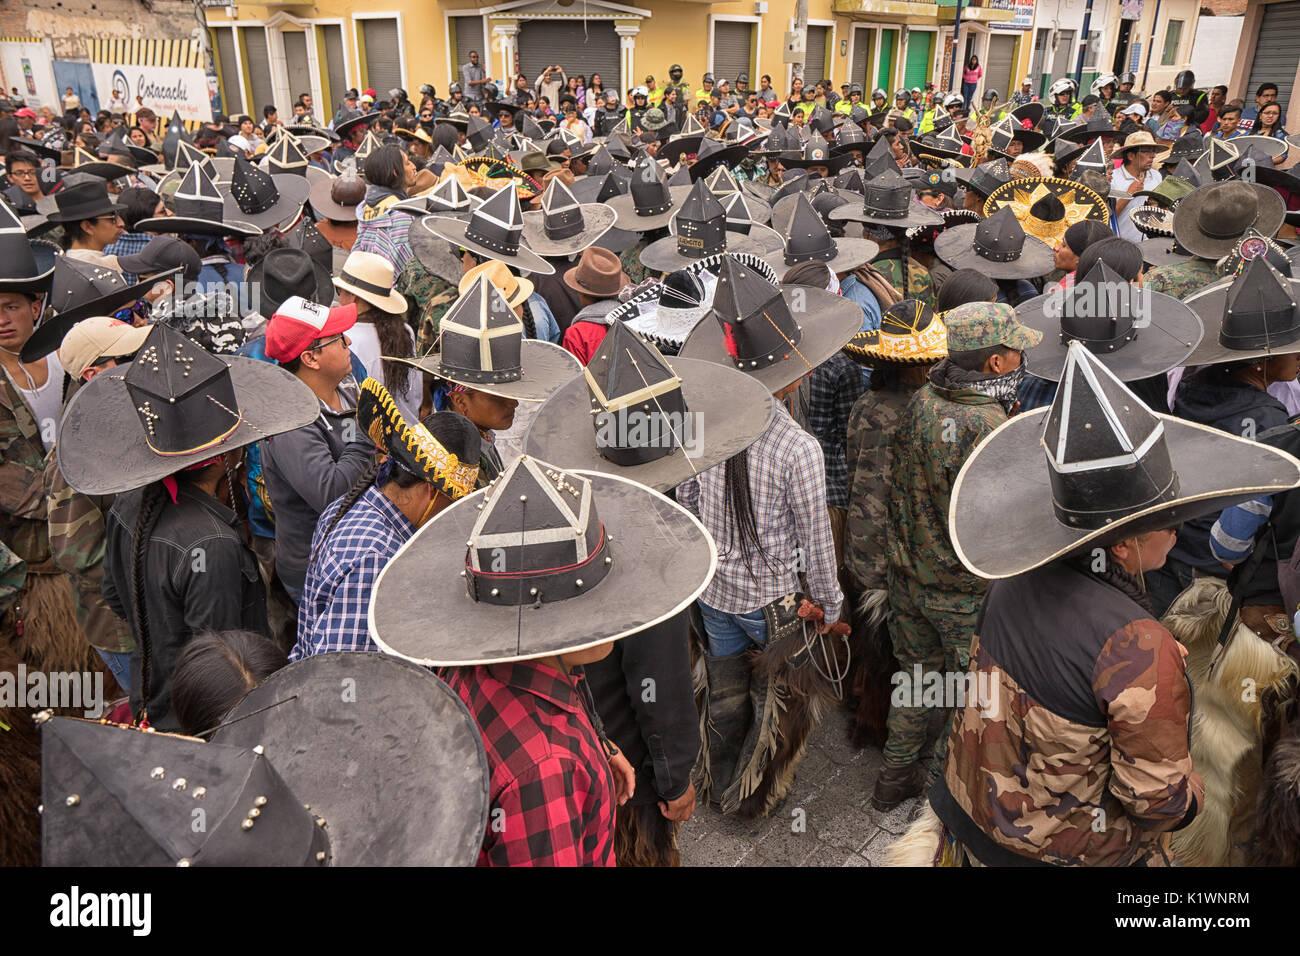 June 24, 2017 Cotacachi, Ecuador: street filled with dancing indigenous kichwa men at the Inti Raymi parade at summer solstice - Stock Image